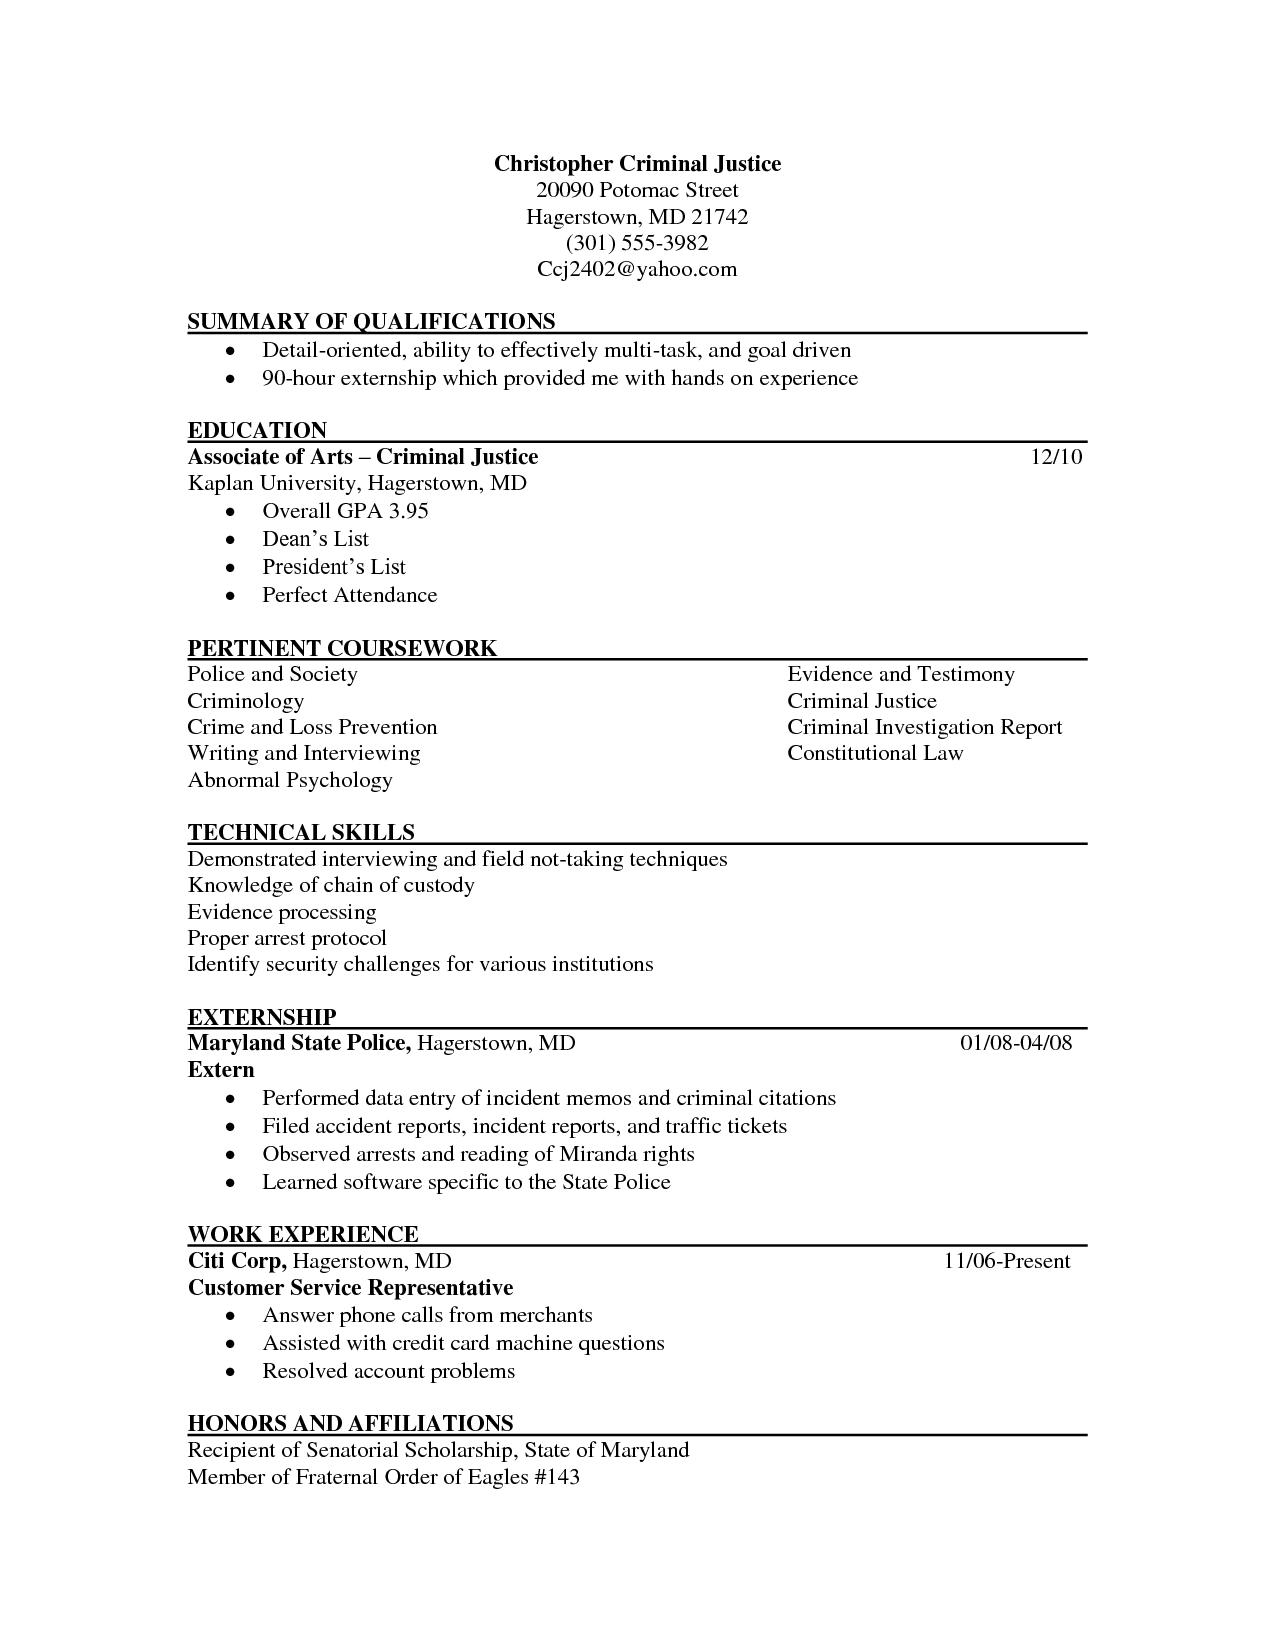 sample resume of registered criminologist